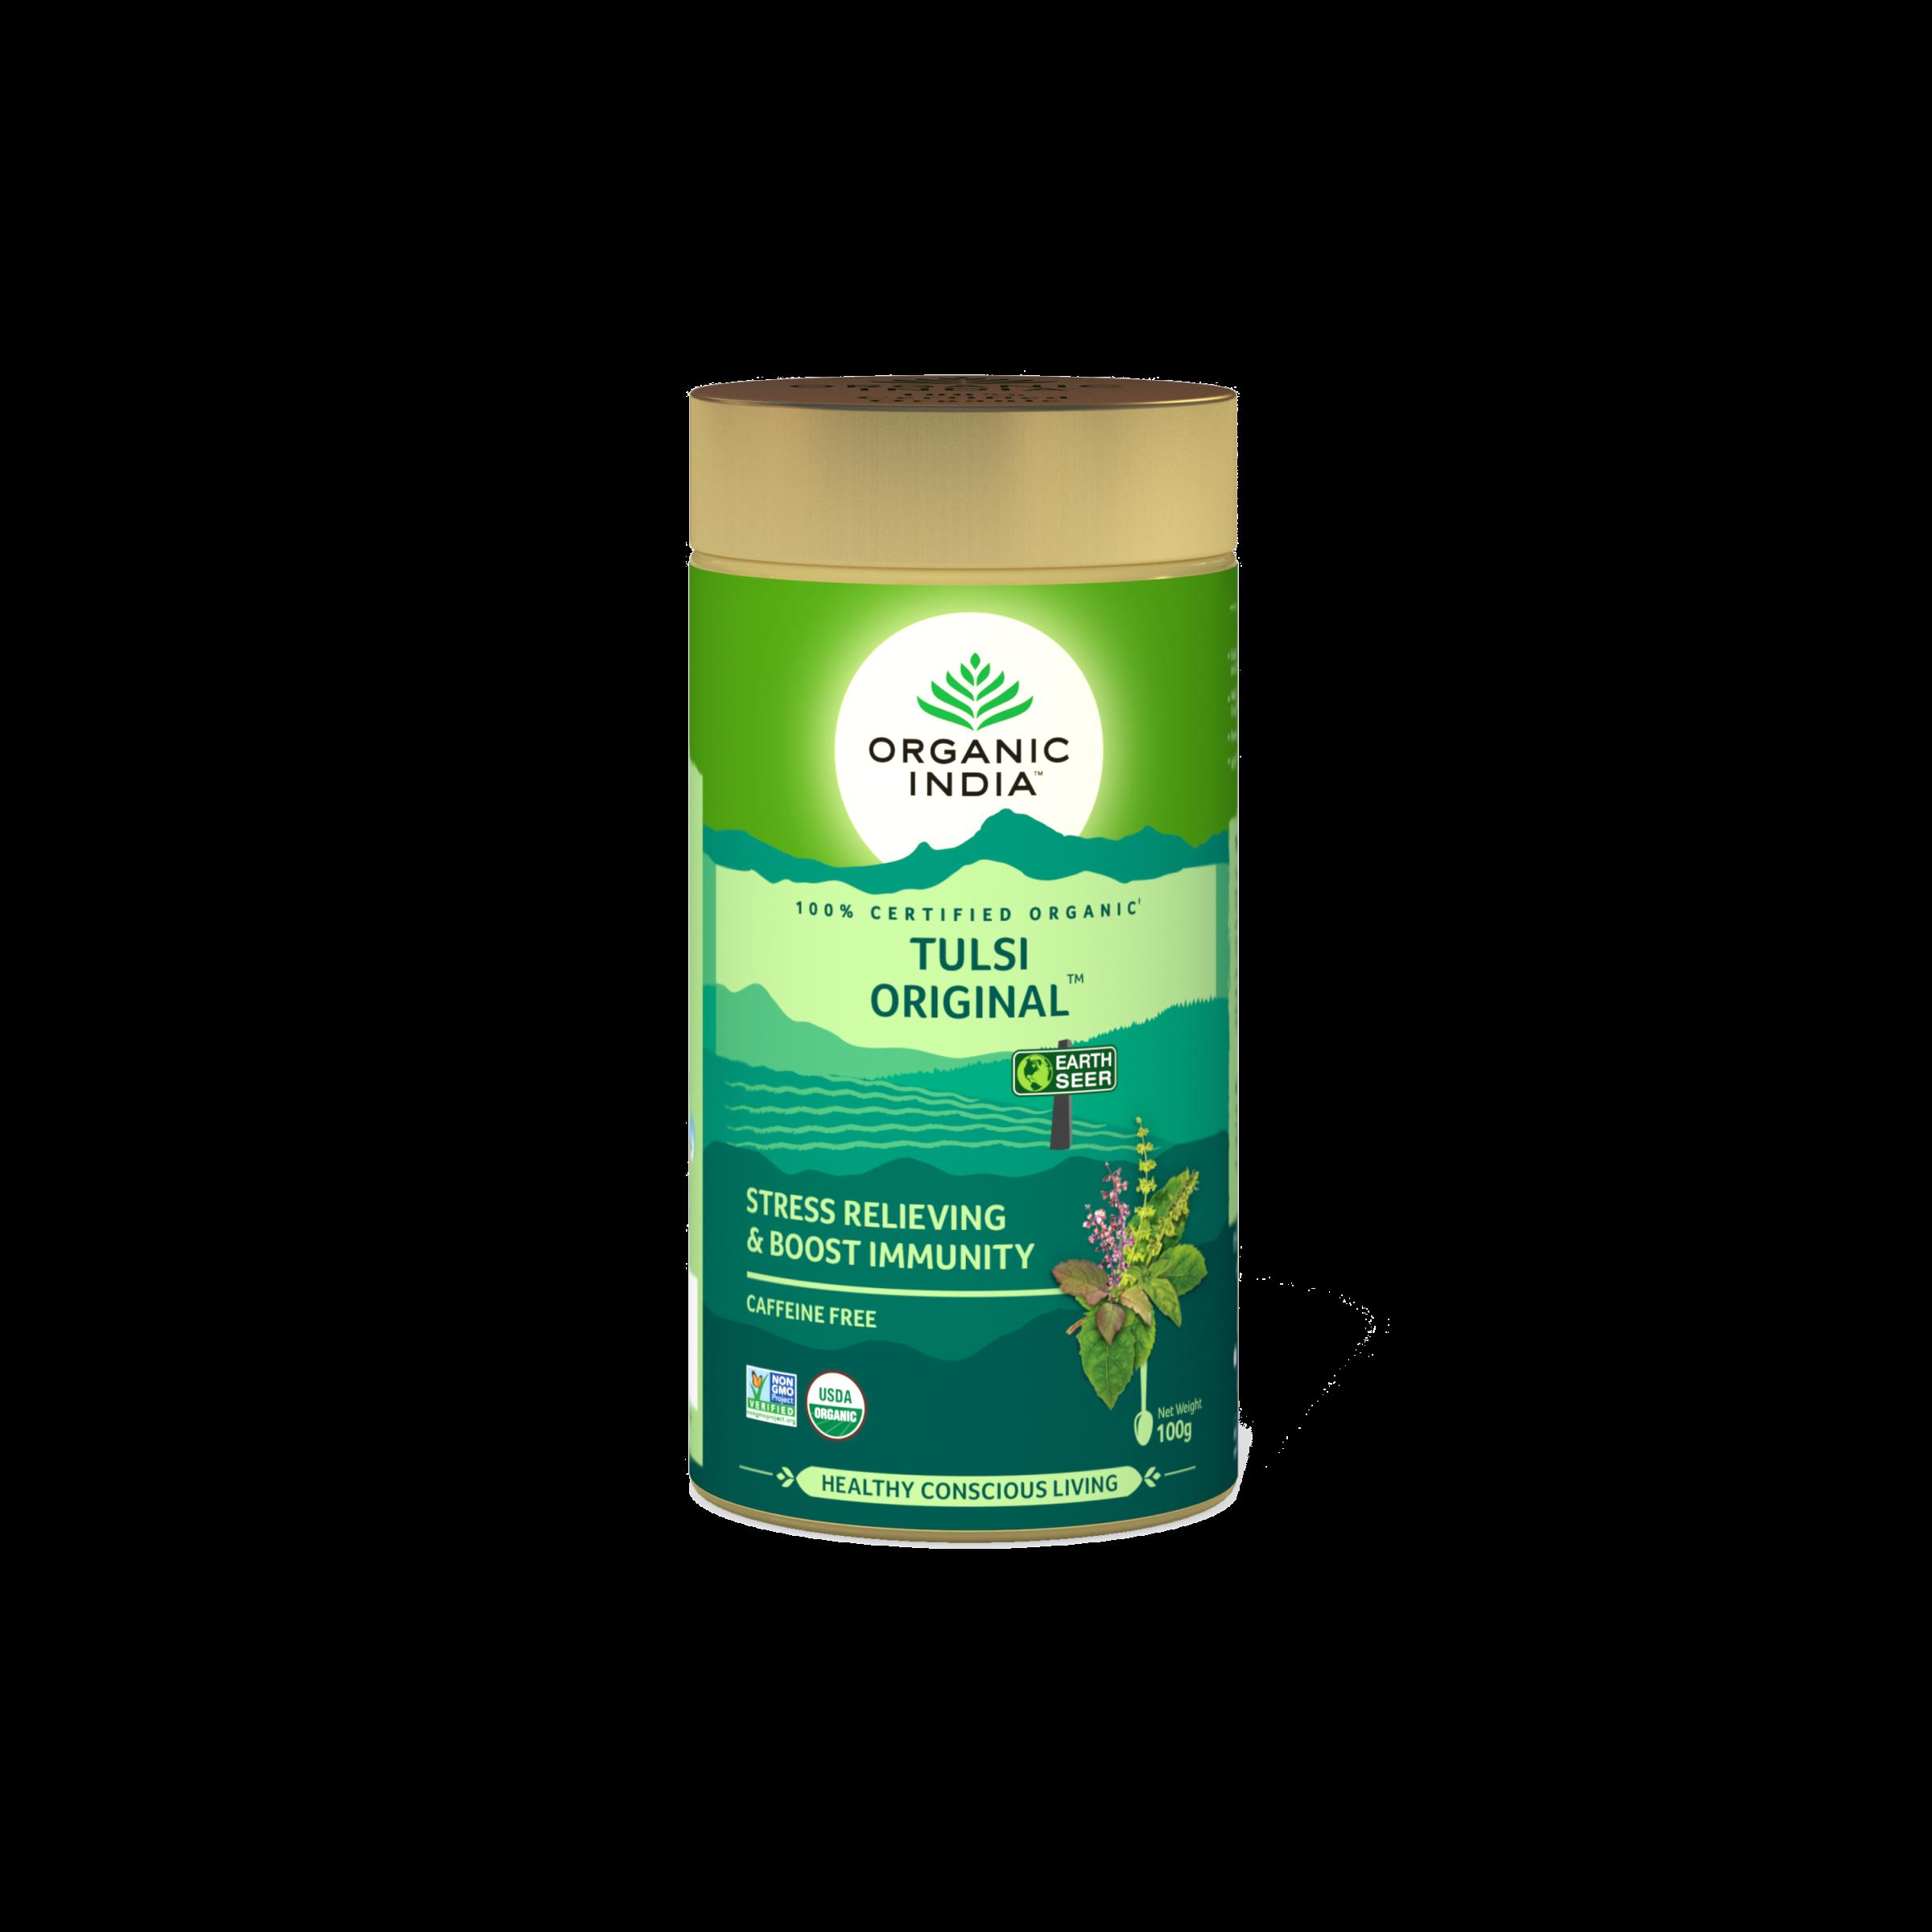 Té Organic India Tulsi en Hojas Original